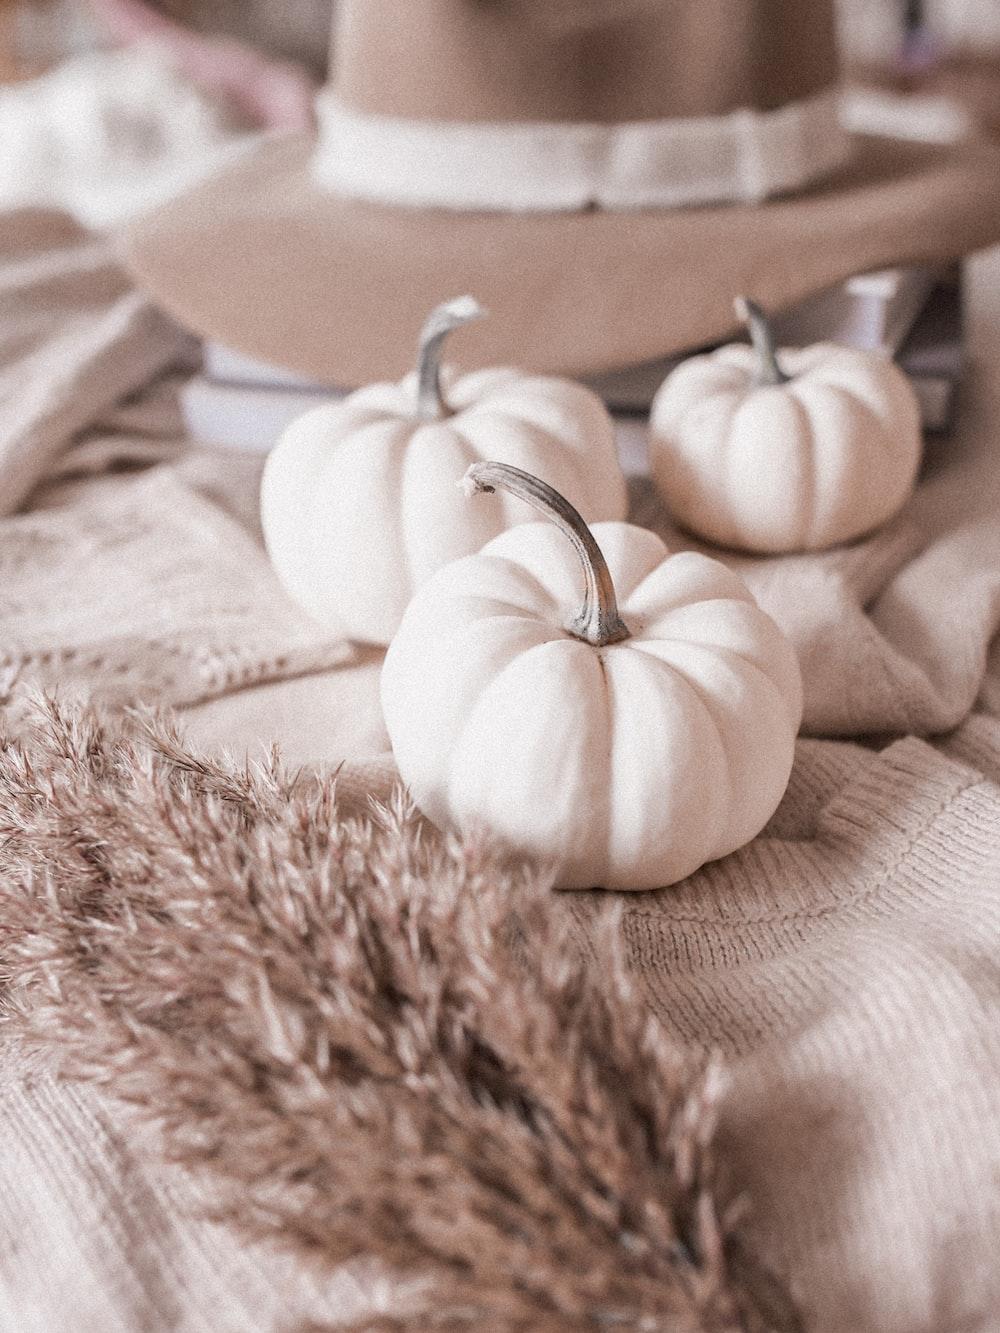 white garlic on brown textile